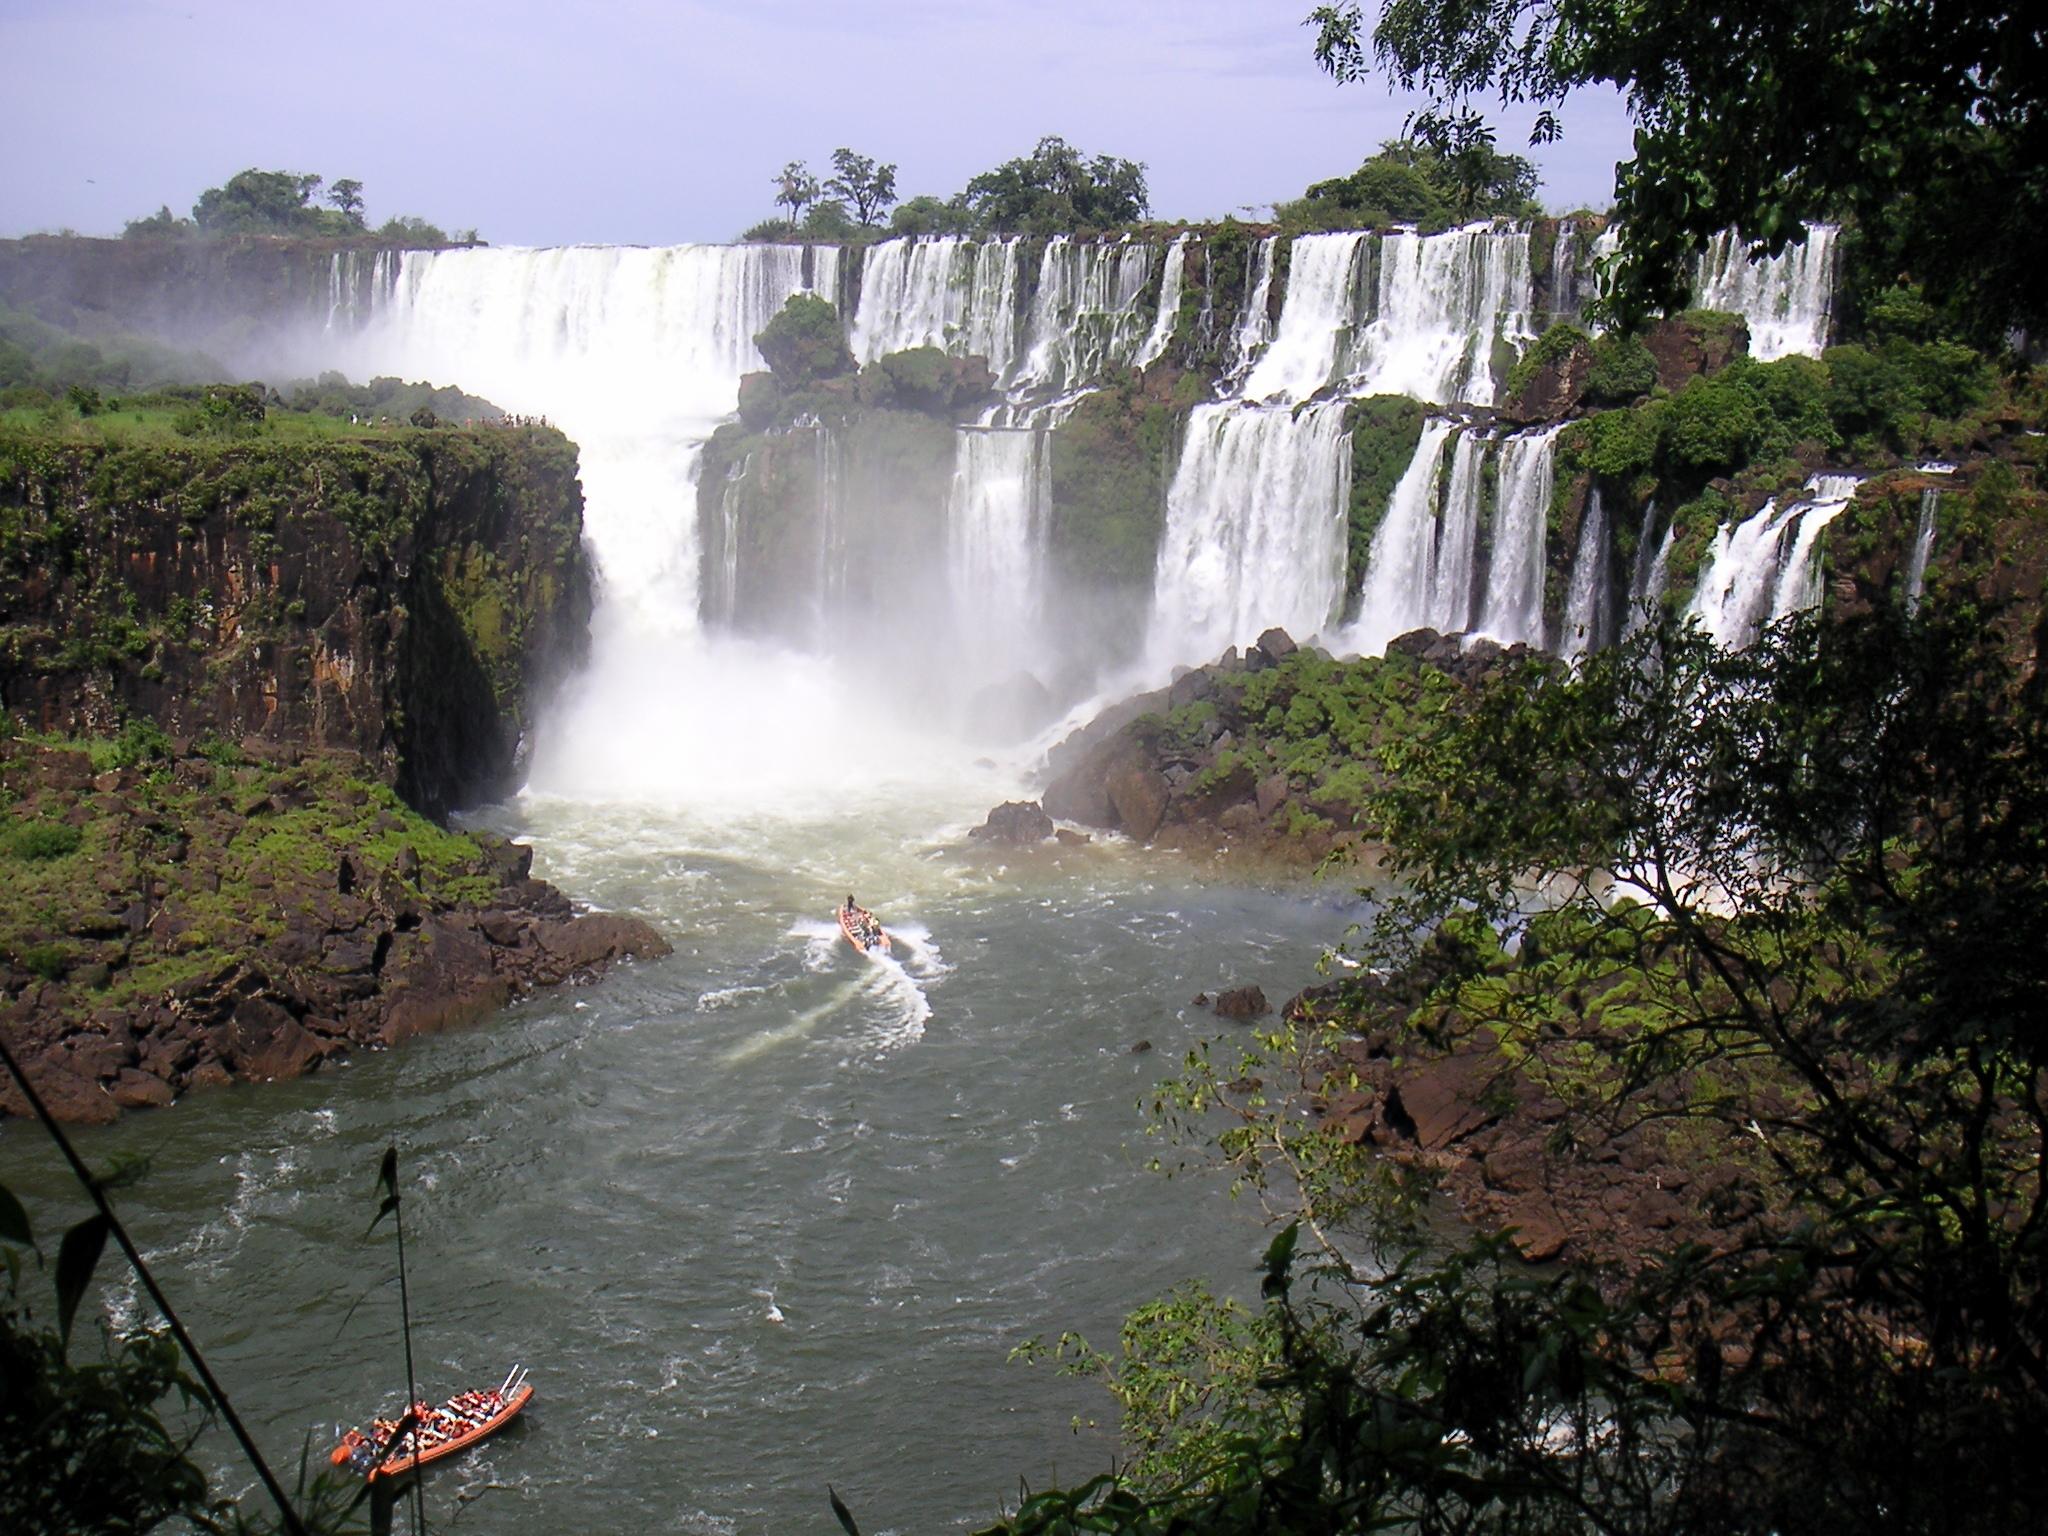 Summer Program - Travel And Tourism | Arcos Journeys: Urban Recycling, Rural School Volunteer, & Iguazu Falls